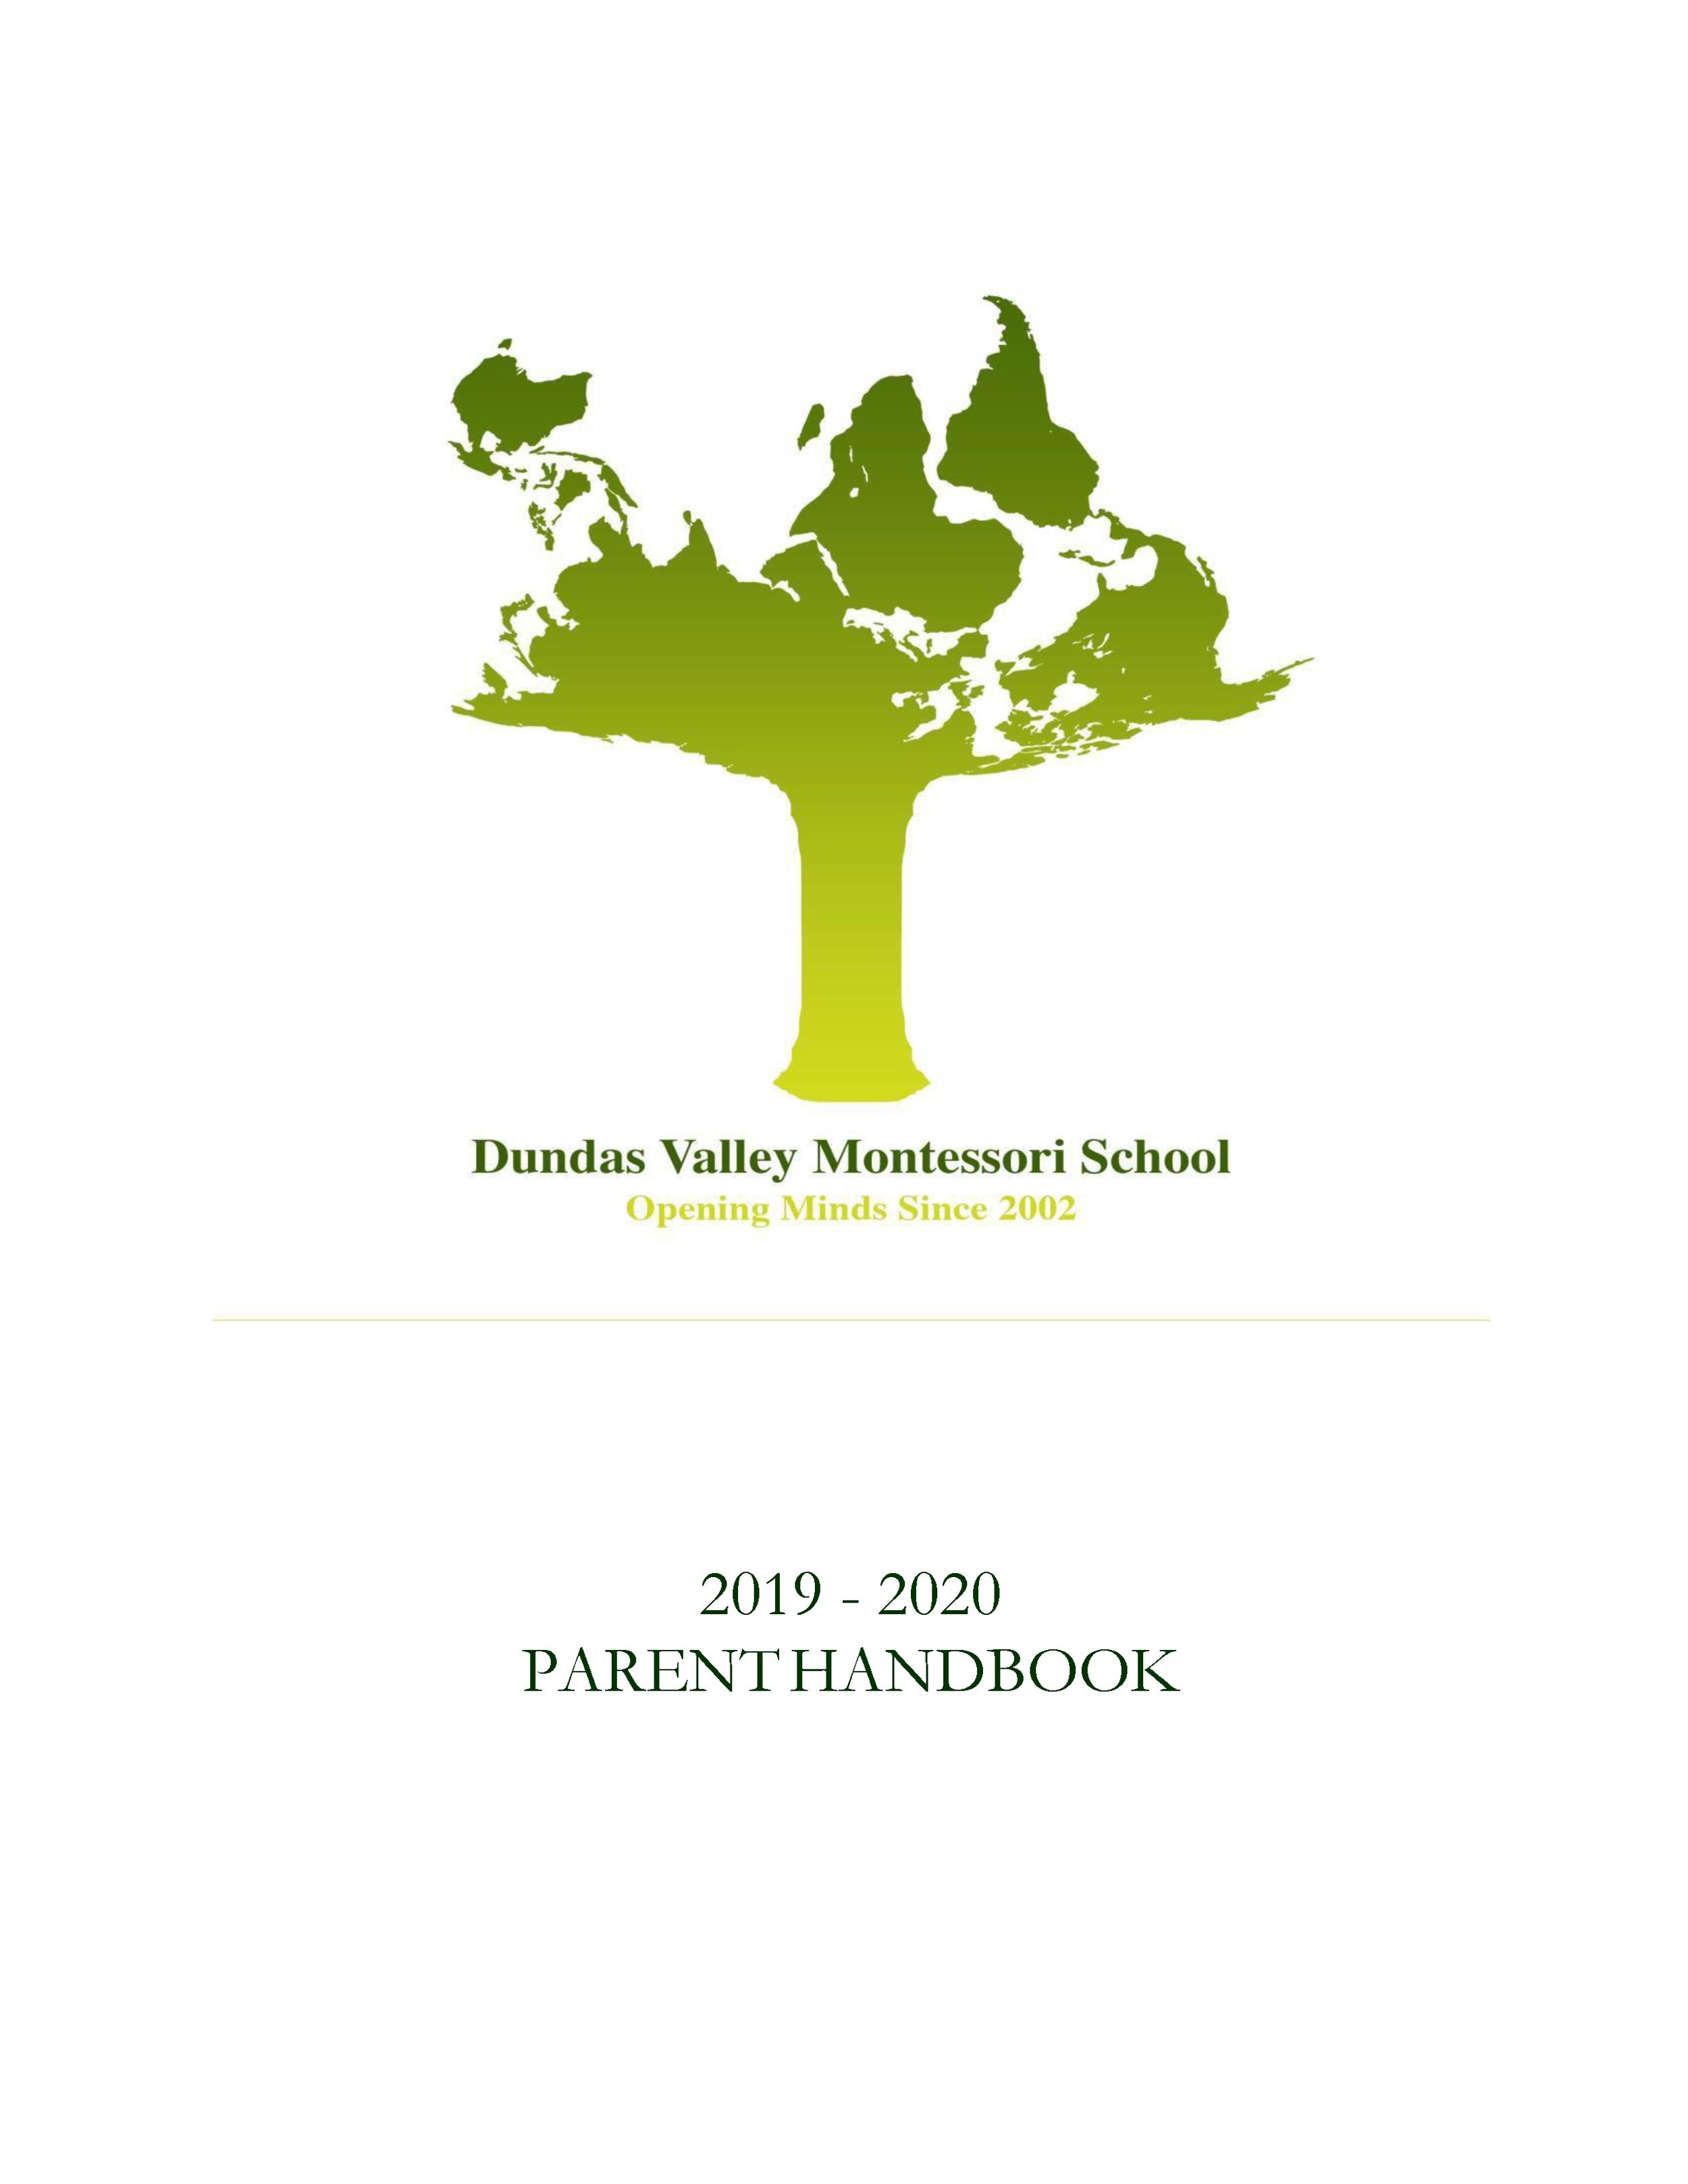 DVMS-Parent-Handbook-19-20_Page_001.png